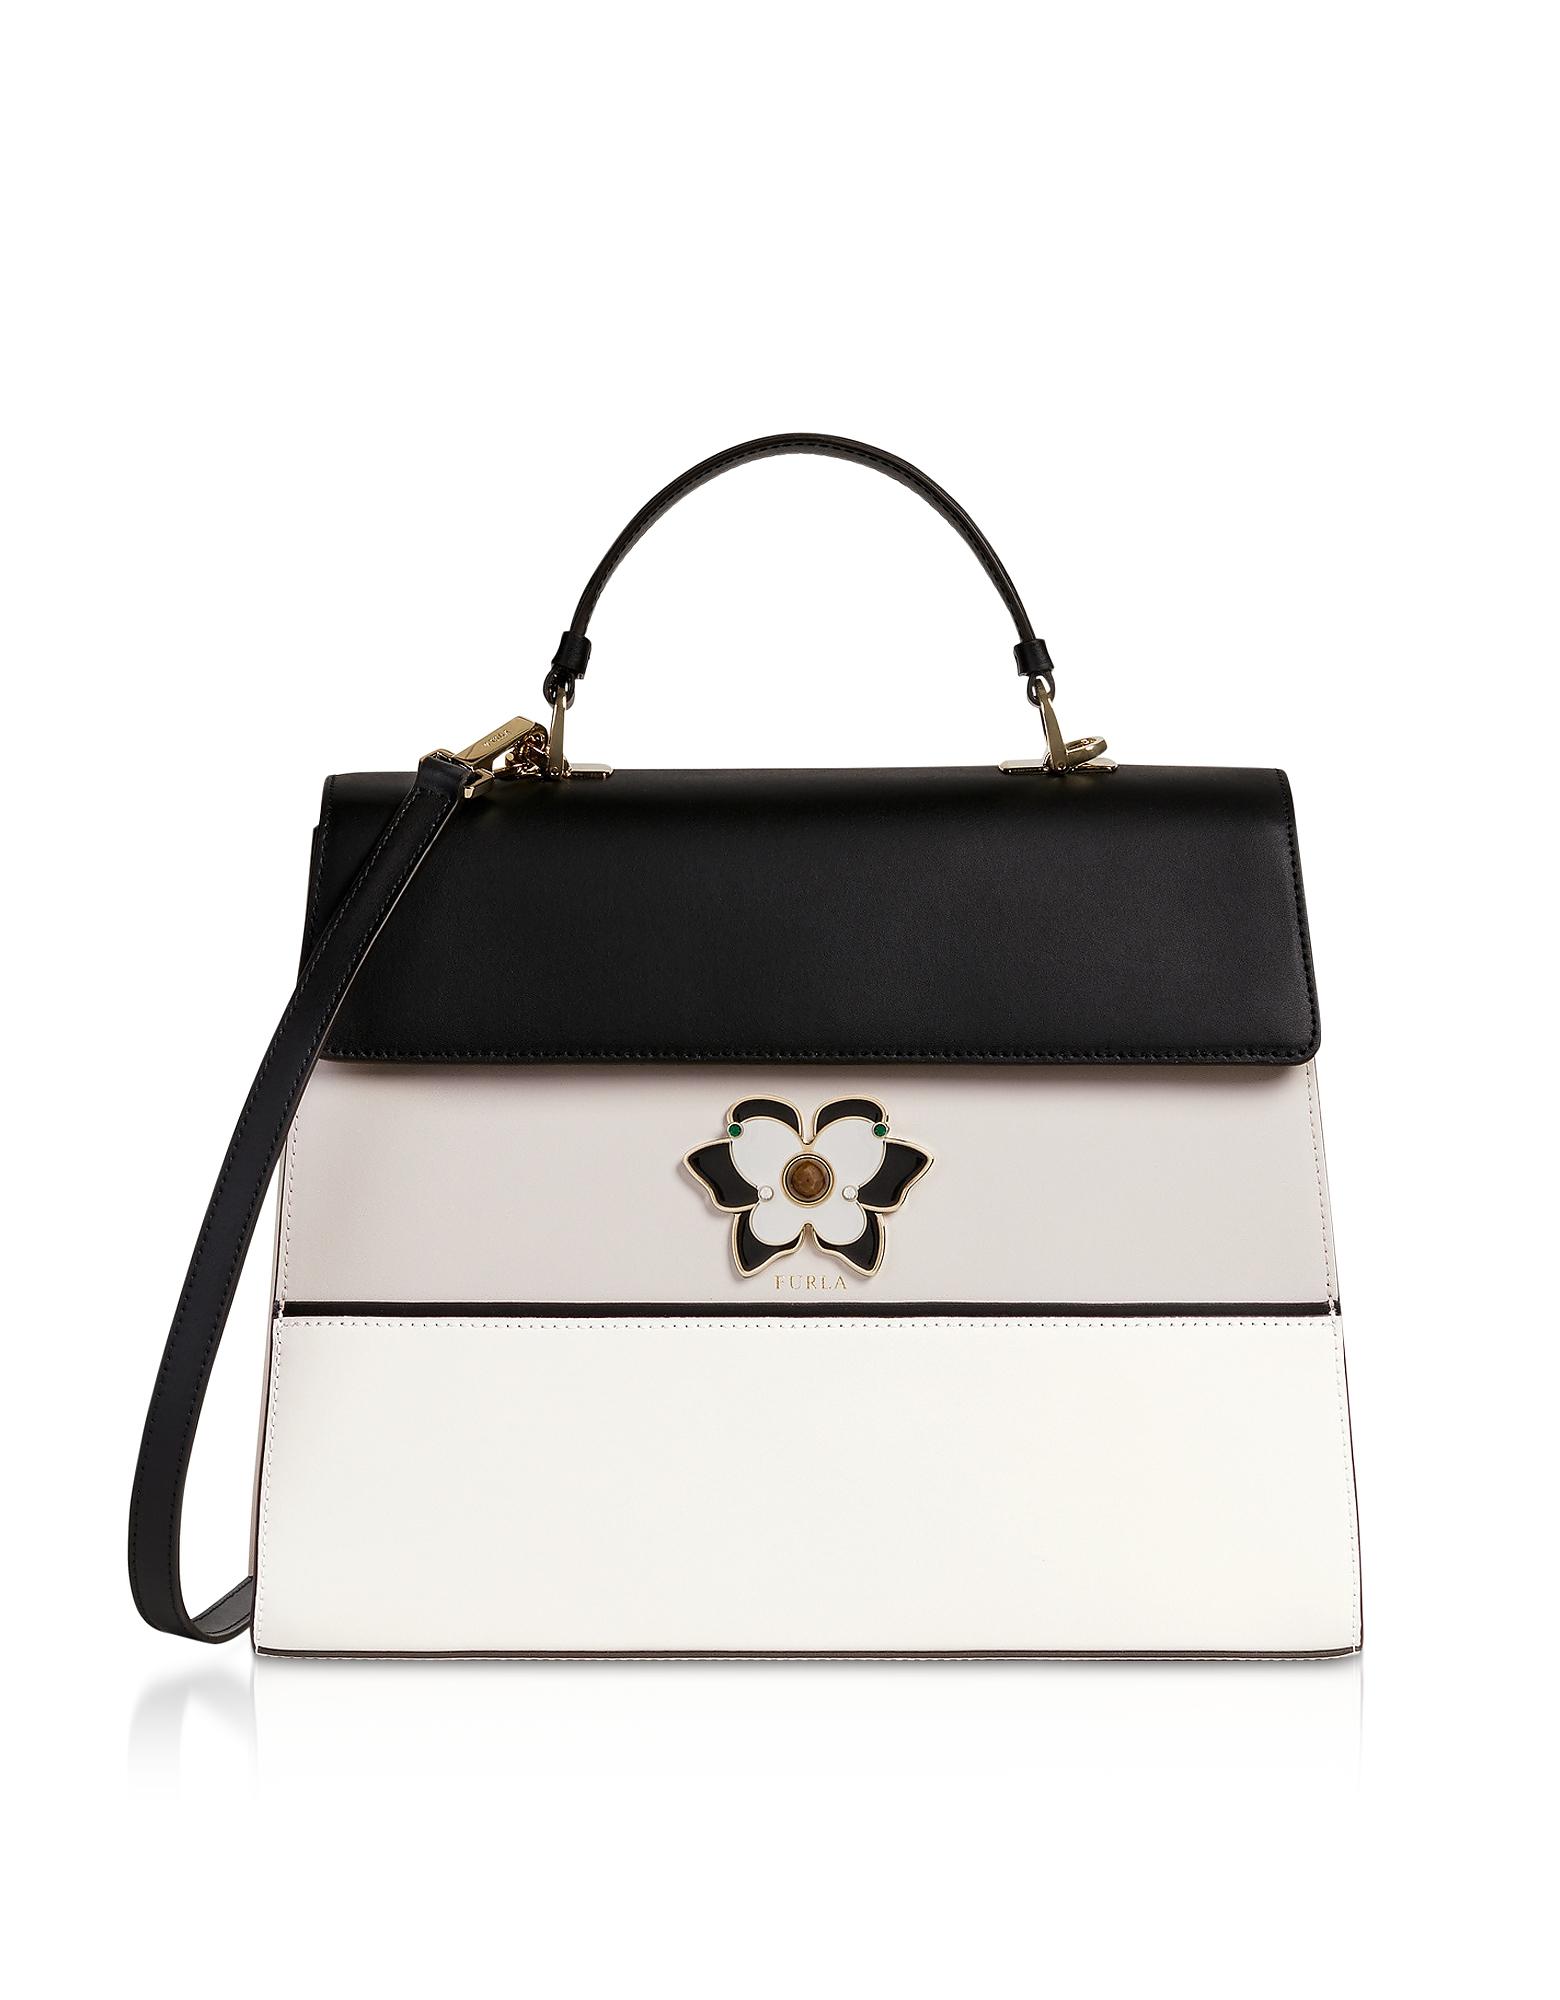 260cbd47f1 FURLA   Furla Designer Handbags, Mughetto Large Top Handle Satchel Bag    Goxip